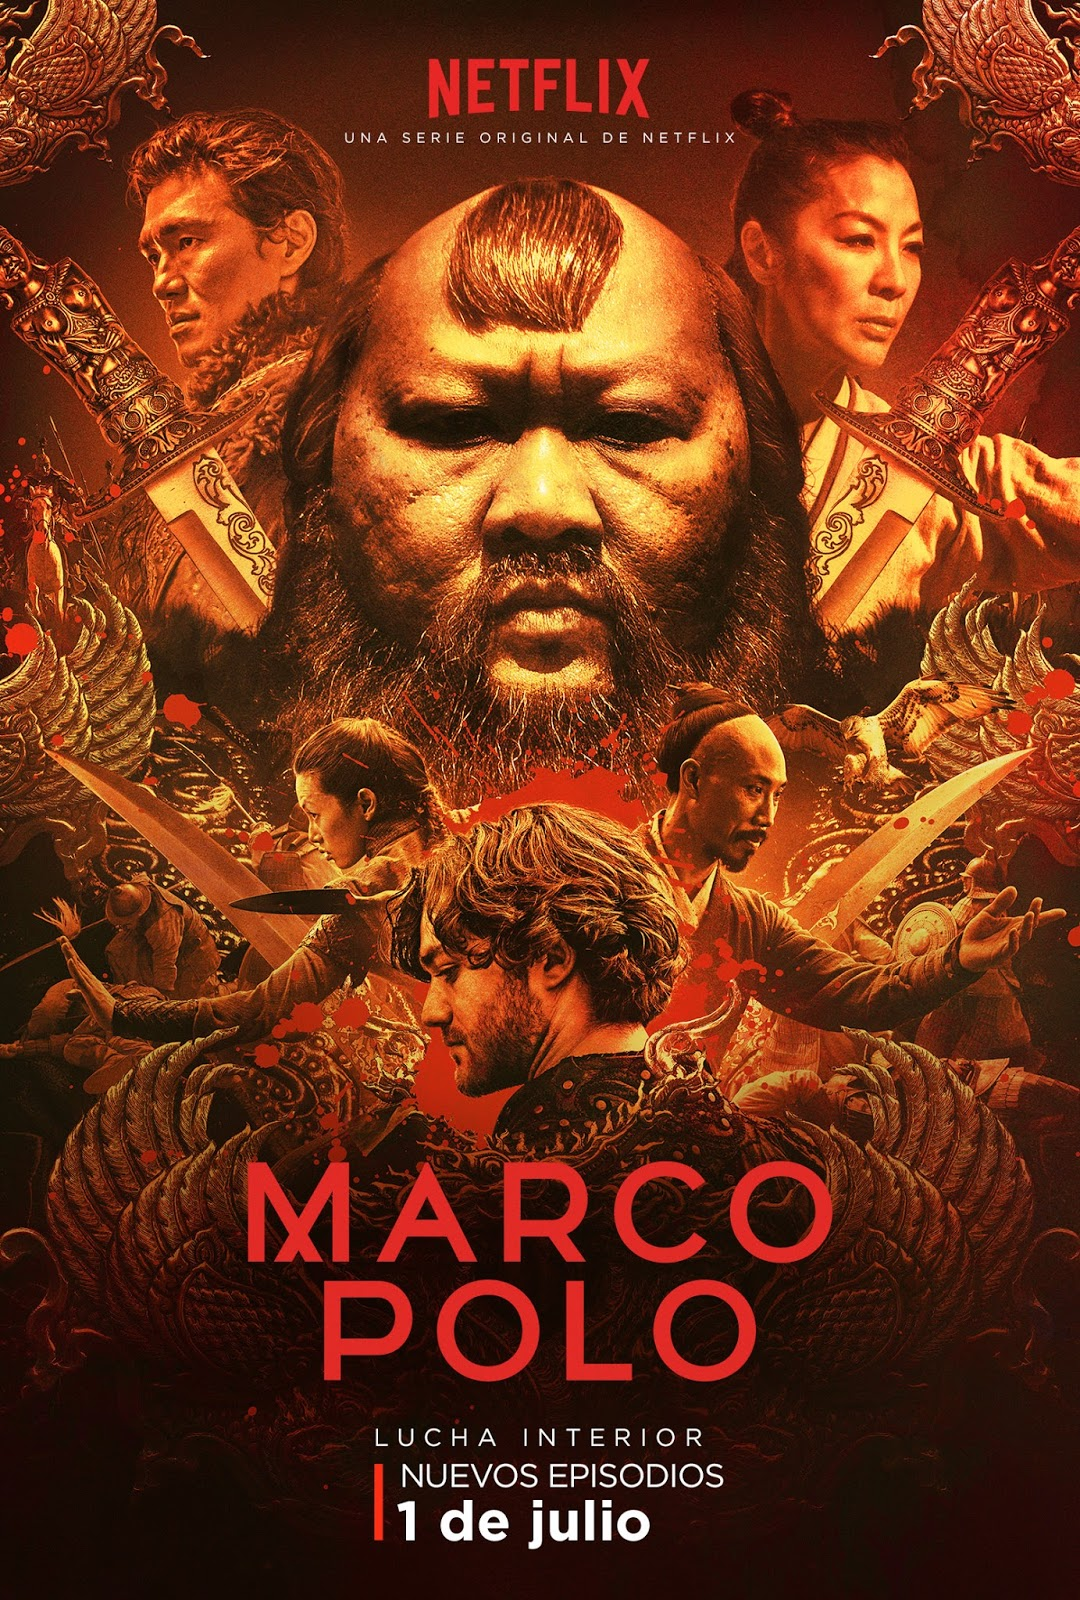 Marco Polo\', primer tráiler y póster oficial de la segunda temporada ...